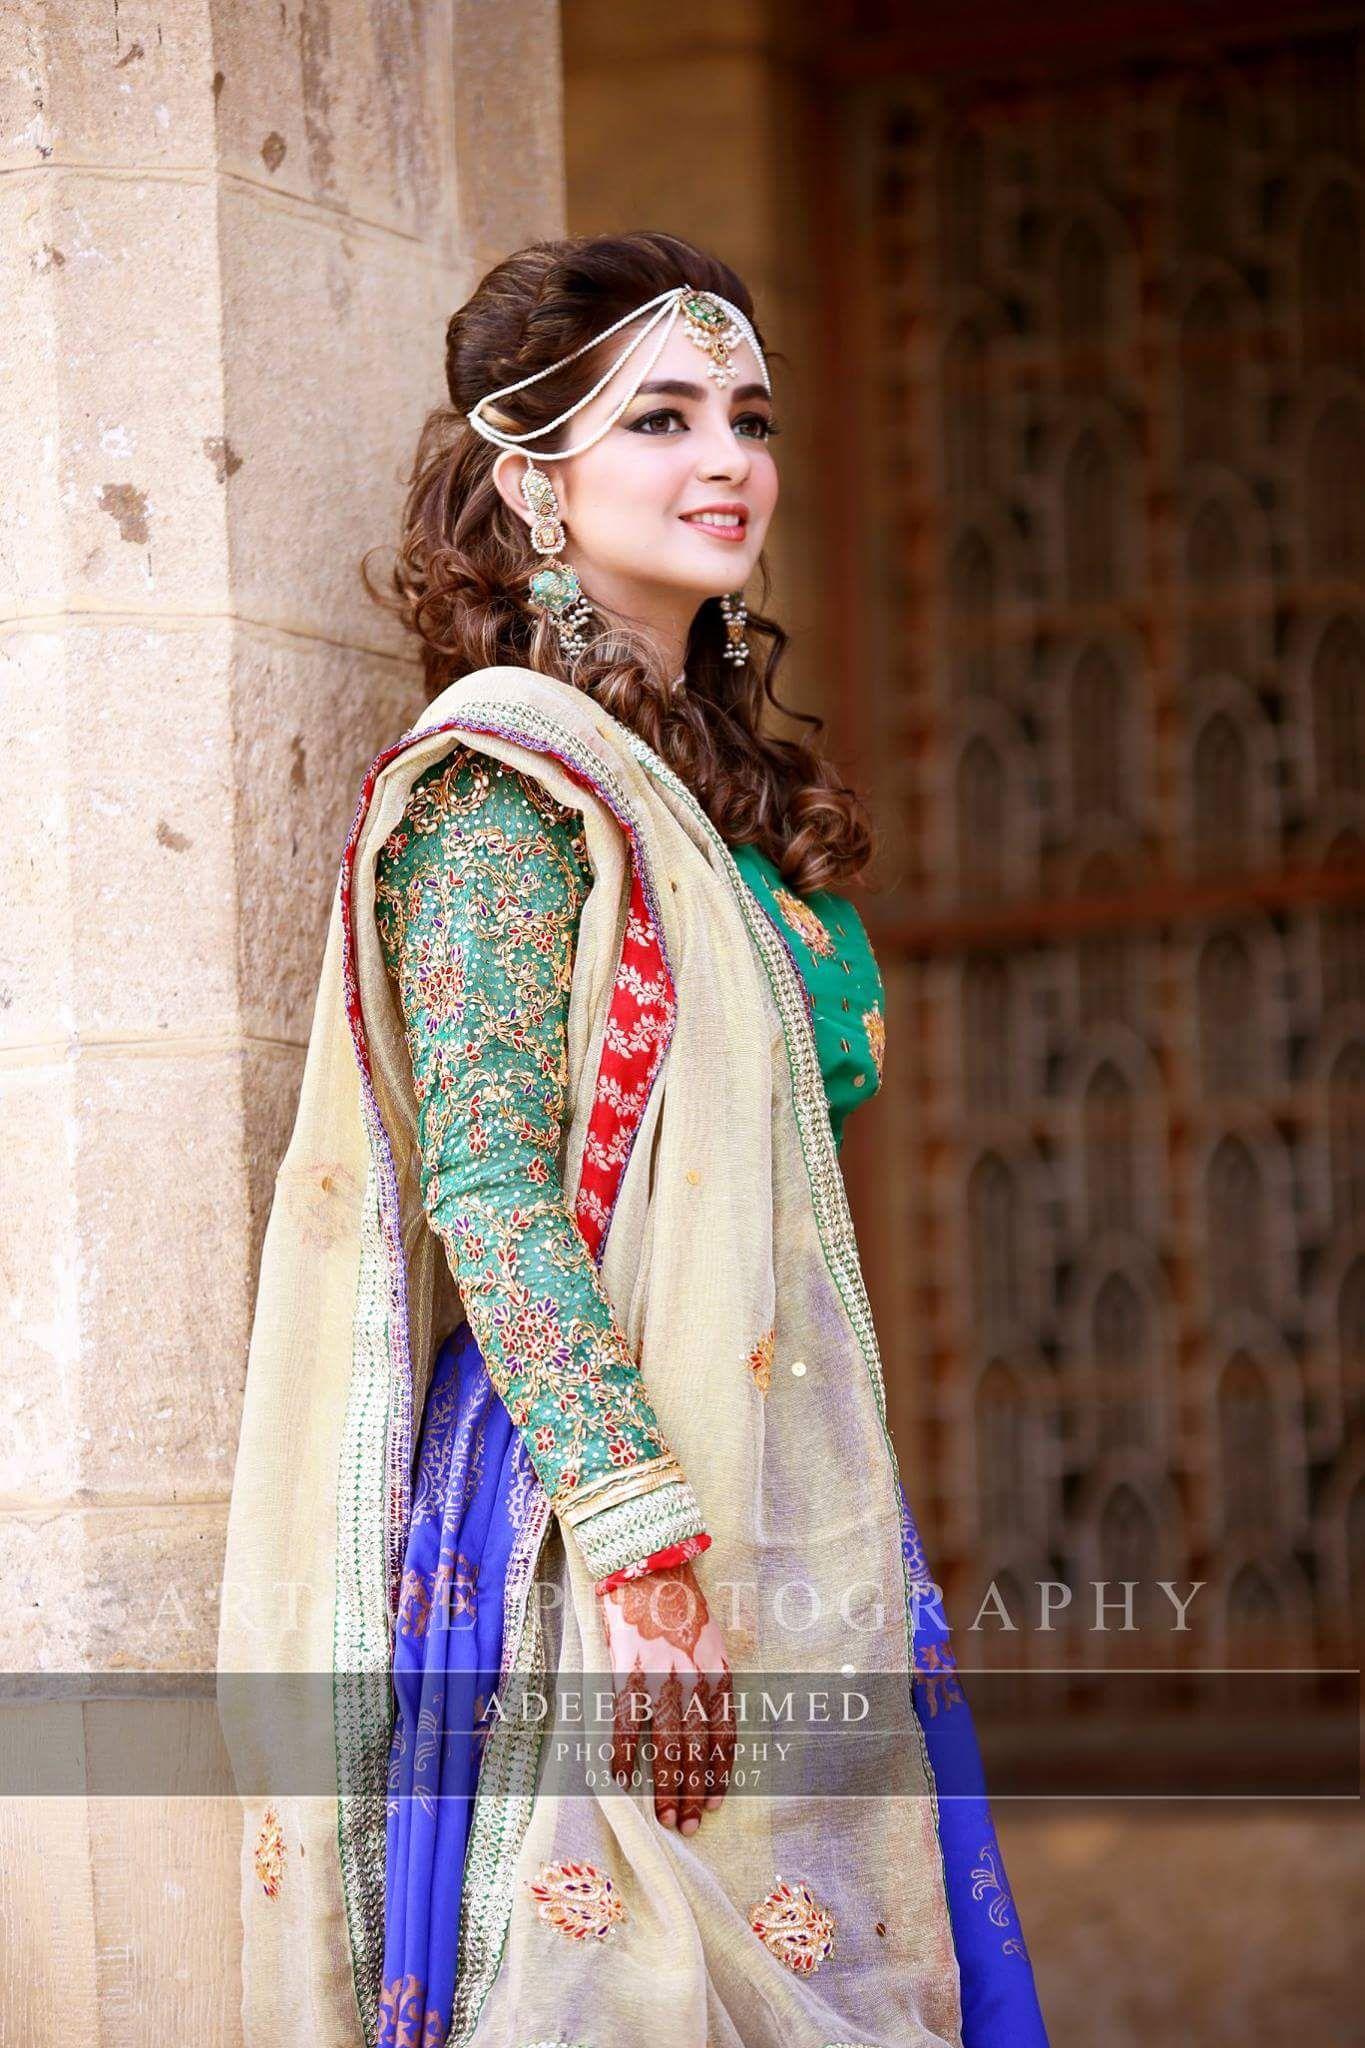 7484350e97 Mehndi bride, Artive studio Adeeb Ahmad photography Dulhan Dress, Mehndi  Dress, Pakistani Wedding